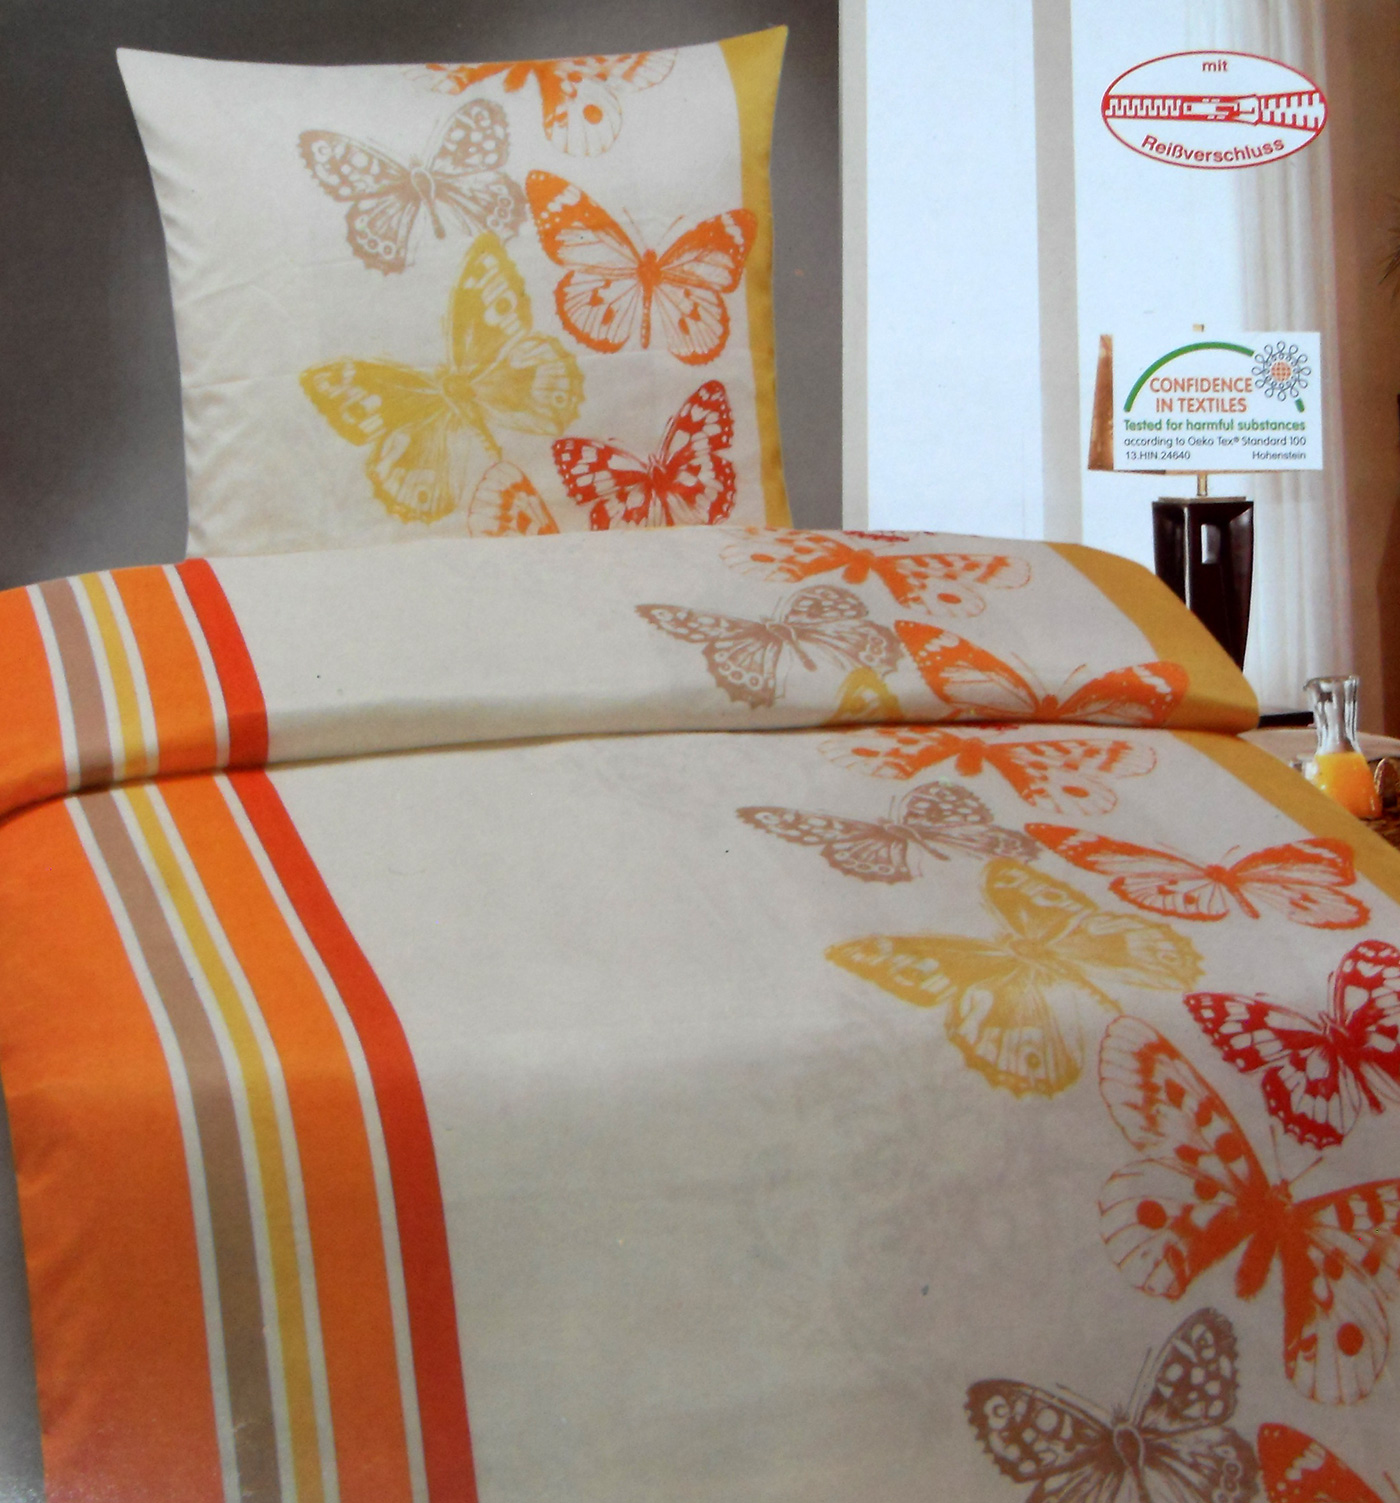 155x220 80x80cm bergr e bettw sche kh. Black Bedroom Furniture Sets. Home Design Ideas